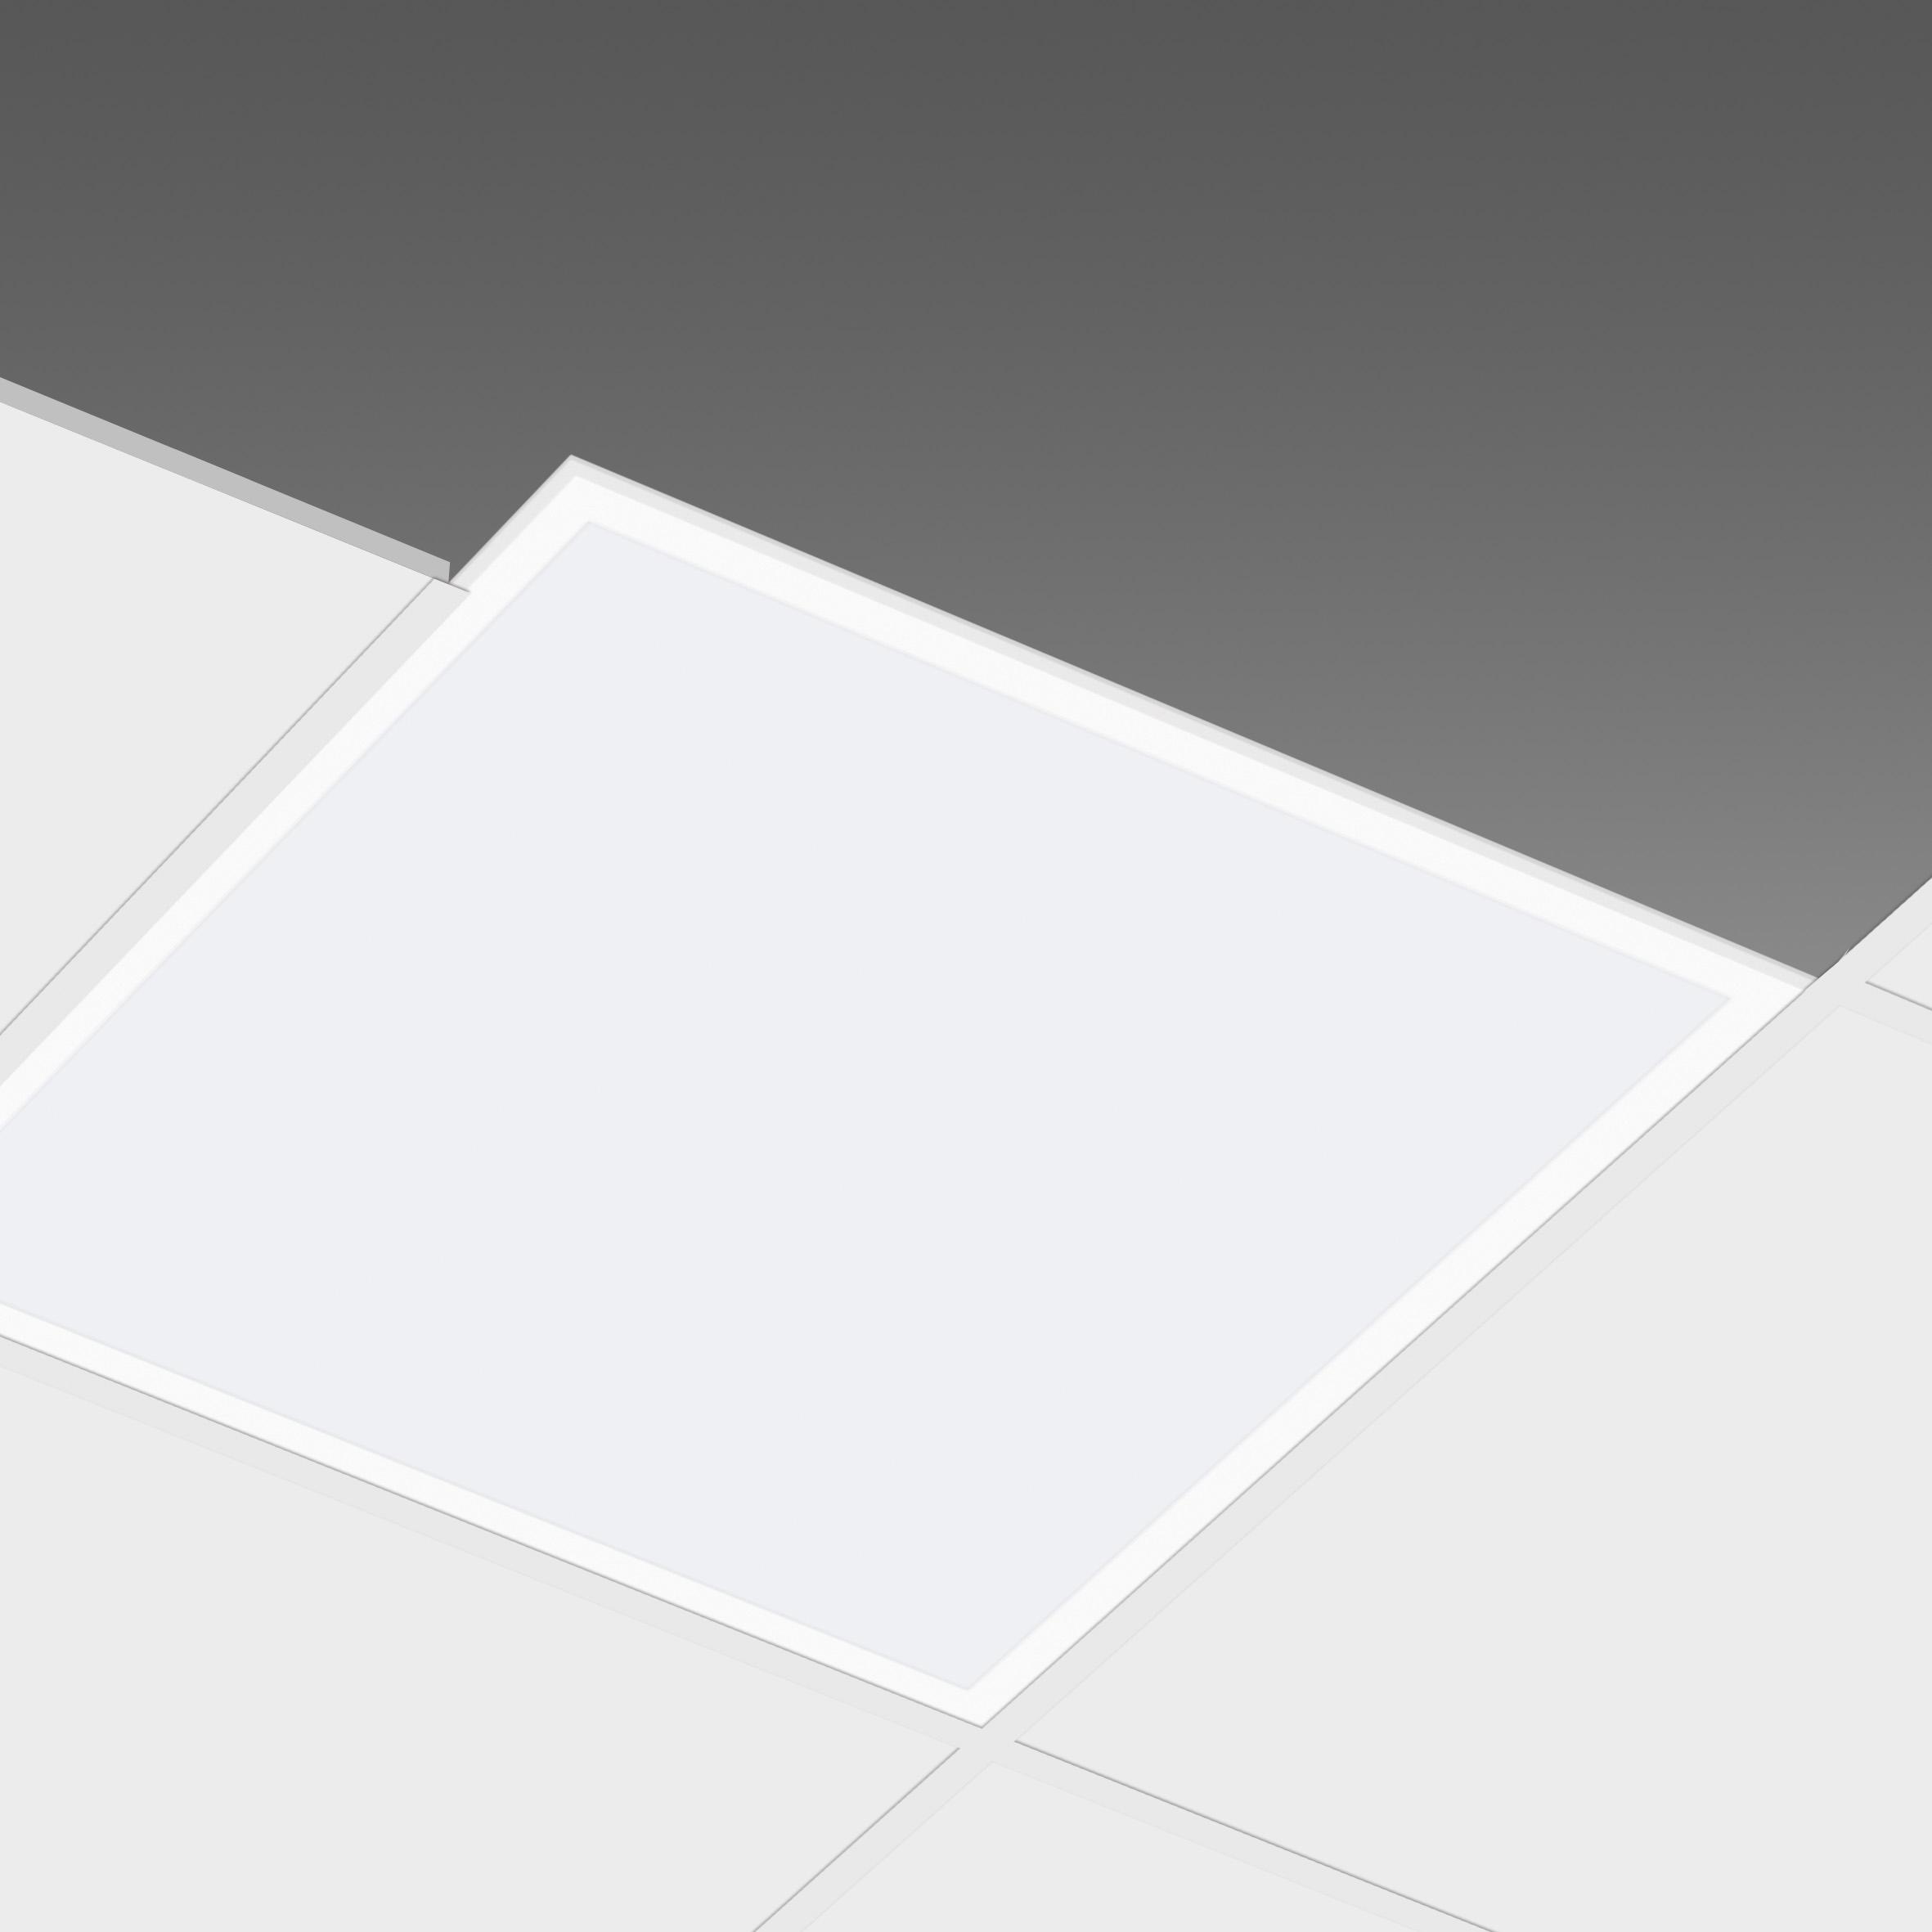 Afbeelding van 150200-00 31W/4000K DIS 840 PANEL CLD CTL LED